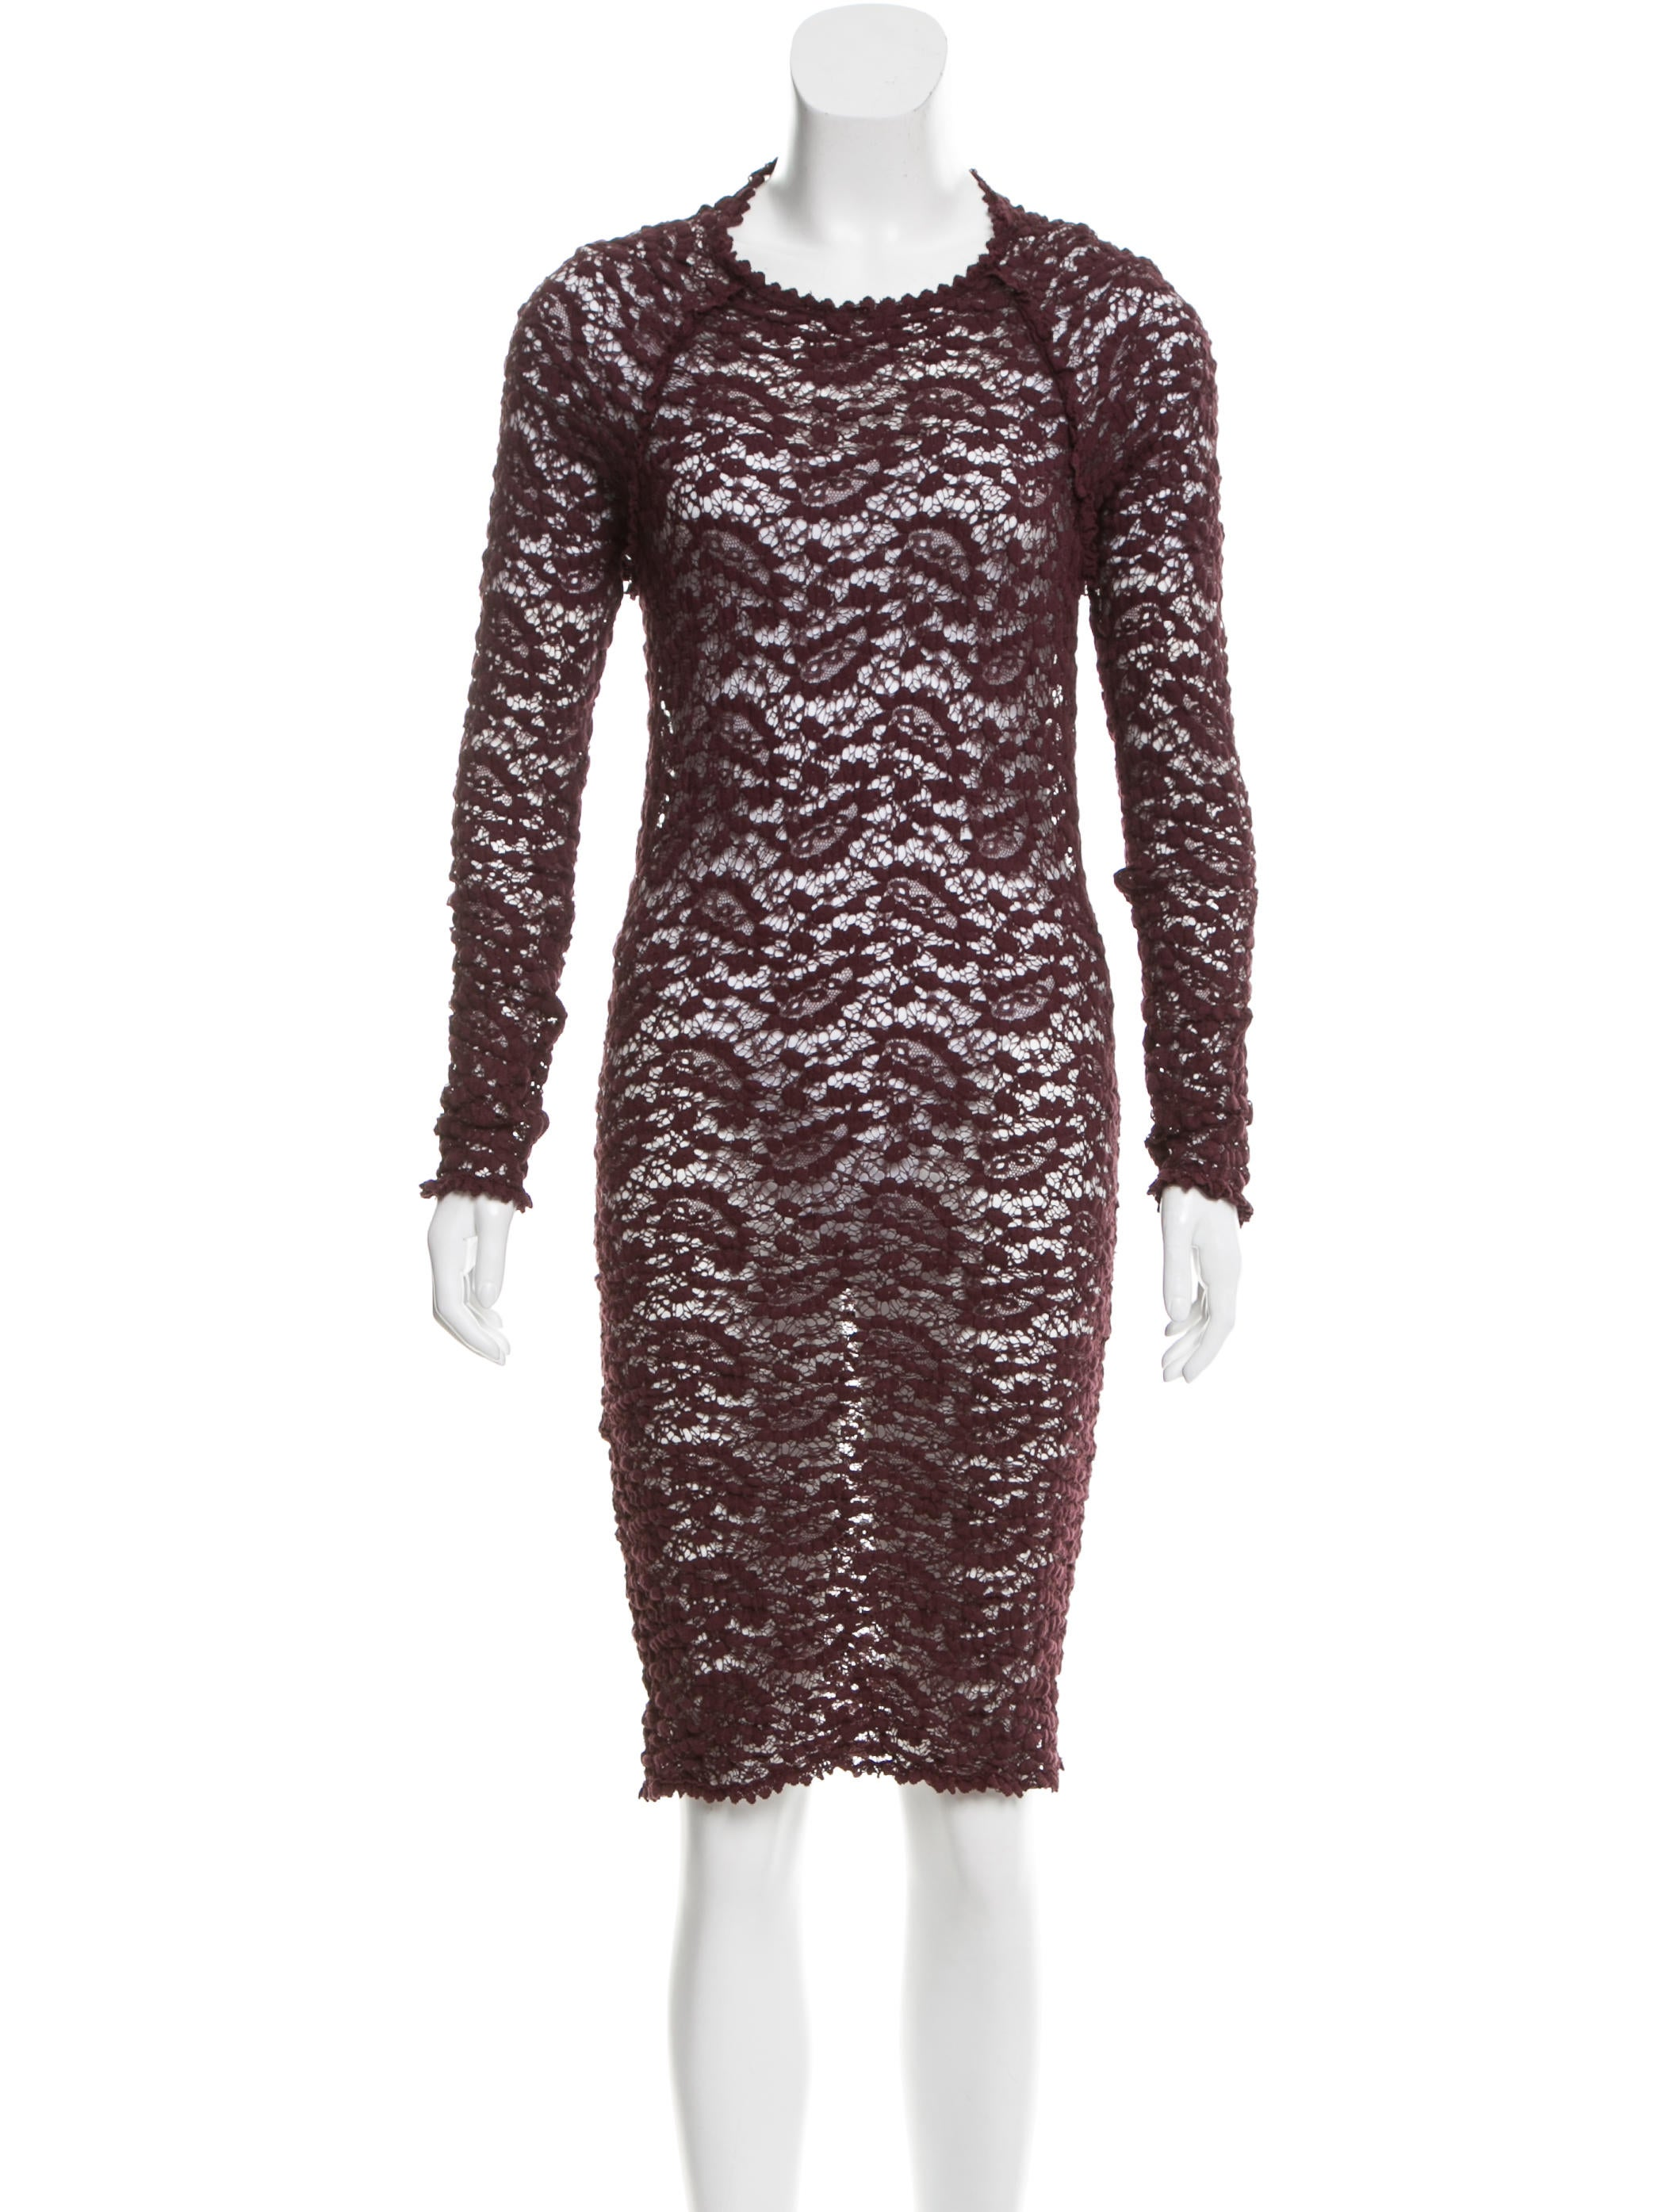 Toile isabel marant lace bodycon dress clothing for Isabel marant shirt dress